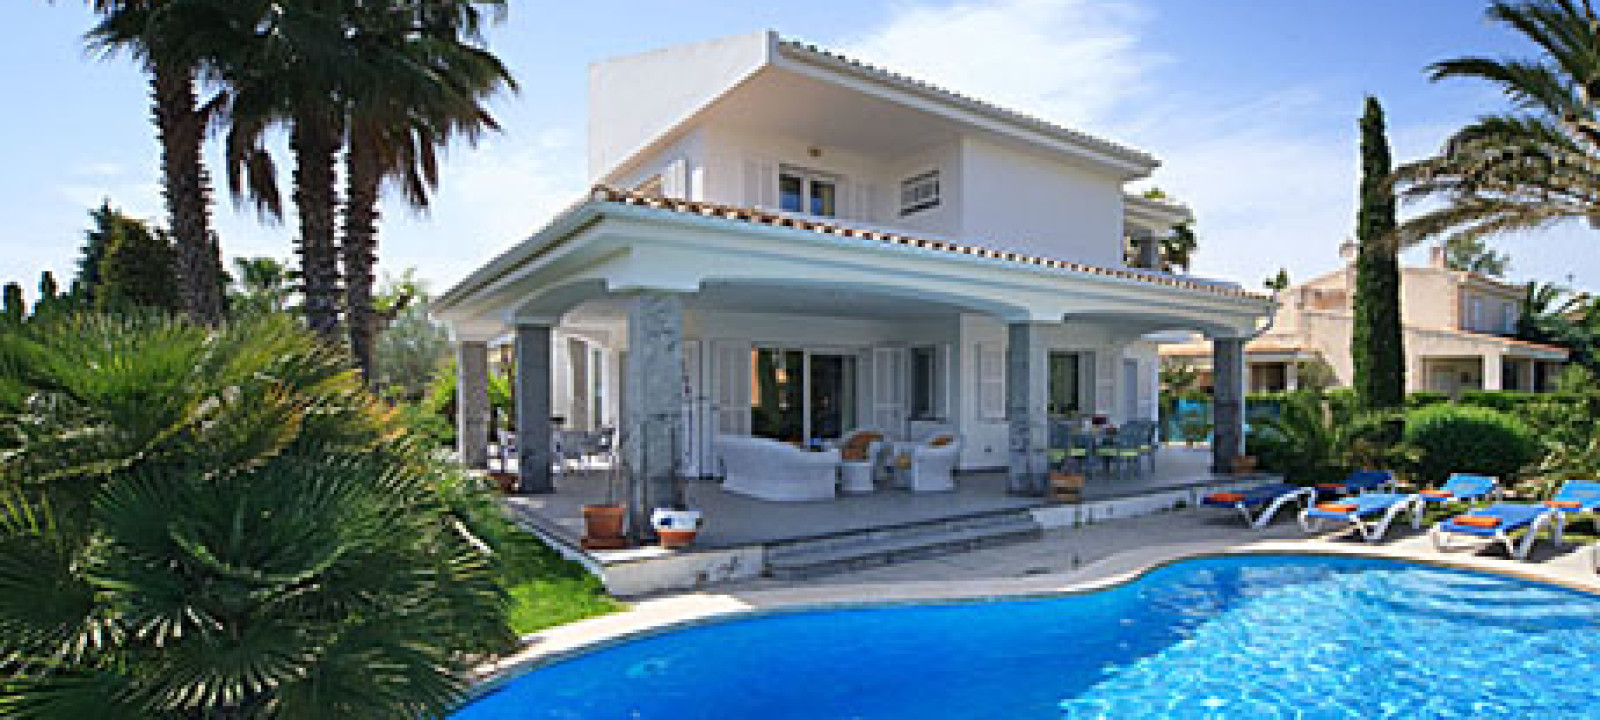 Marjorca Villa, 460×300